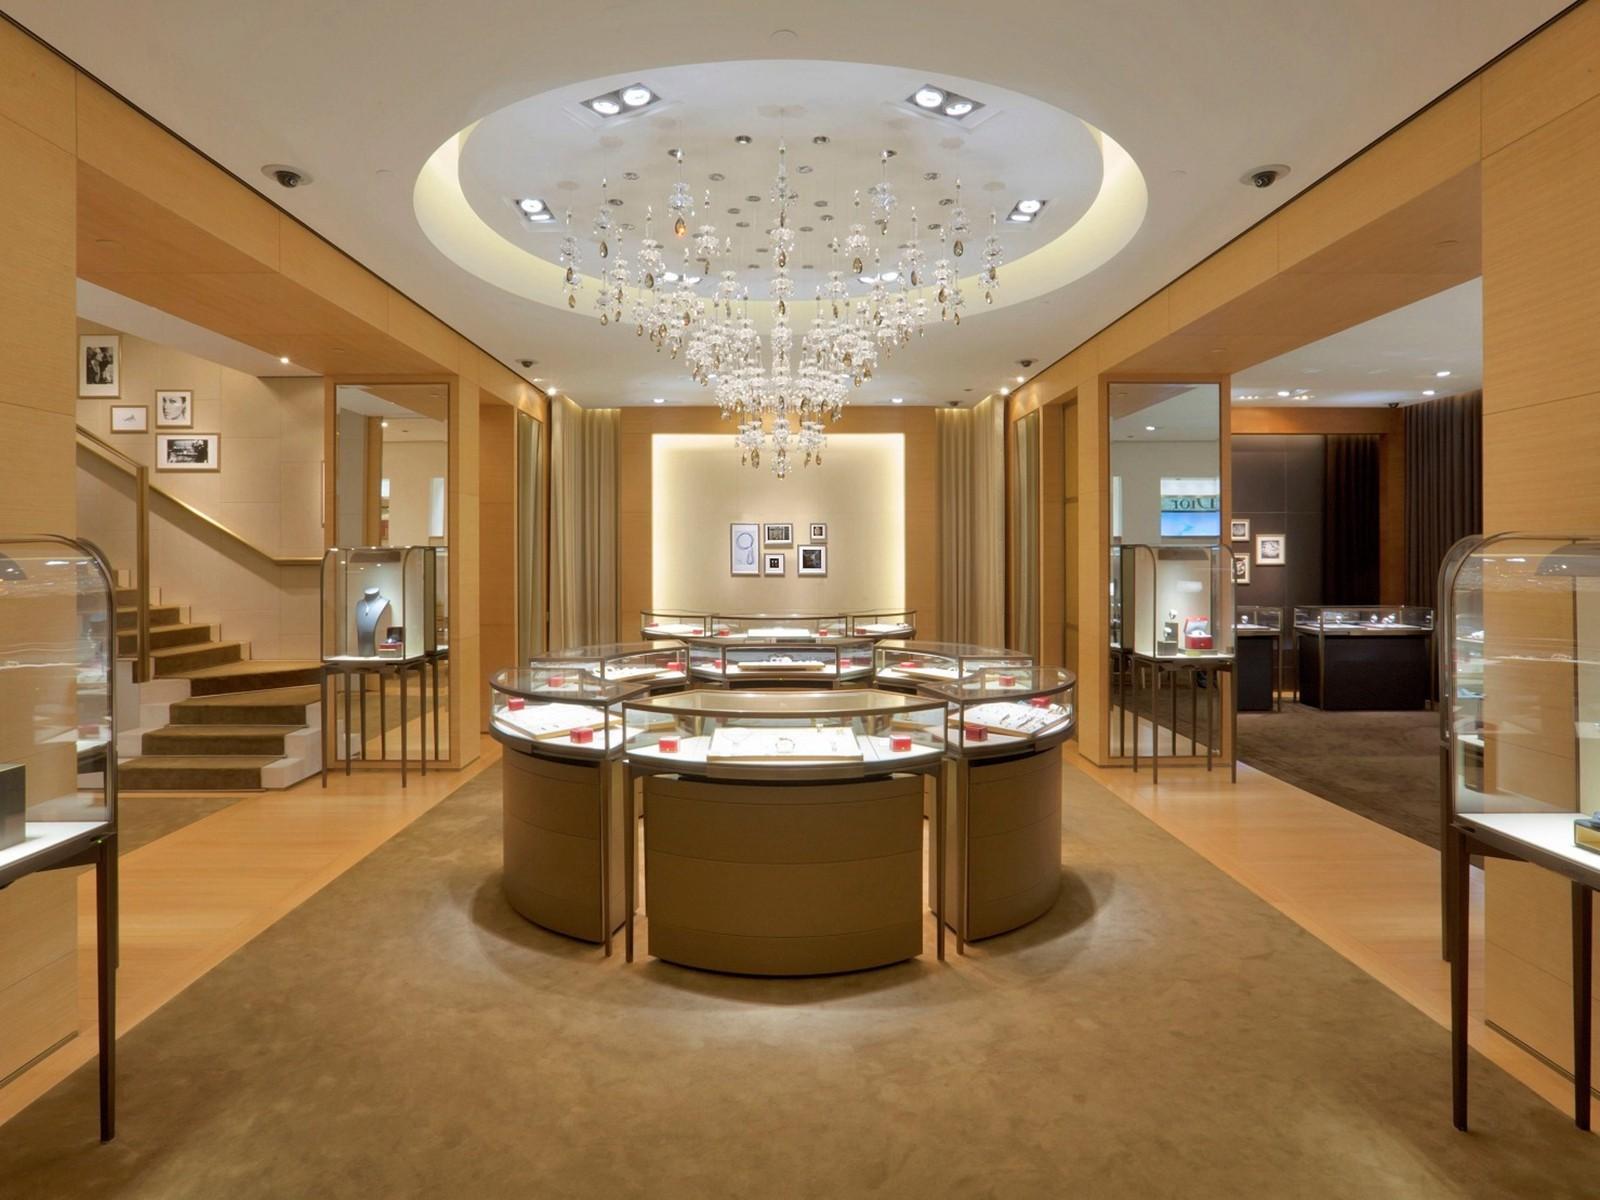 custom jewellery display cabinets OEM for shop OUYEE-4